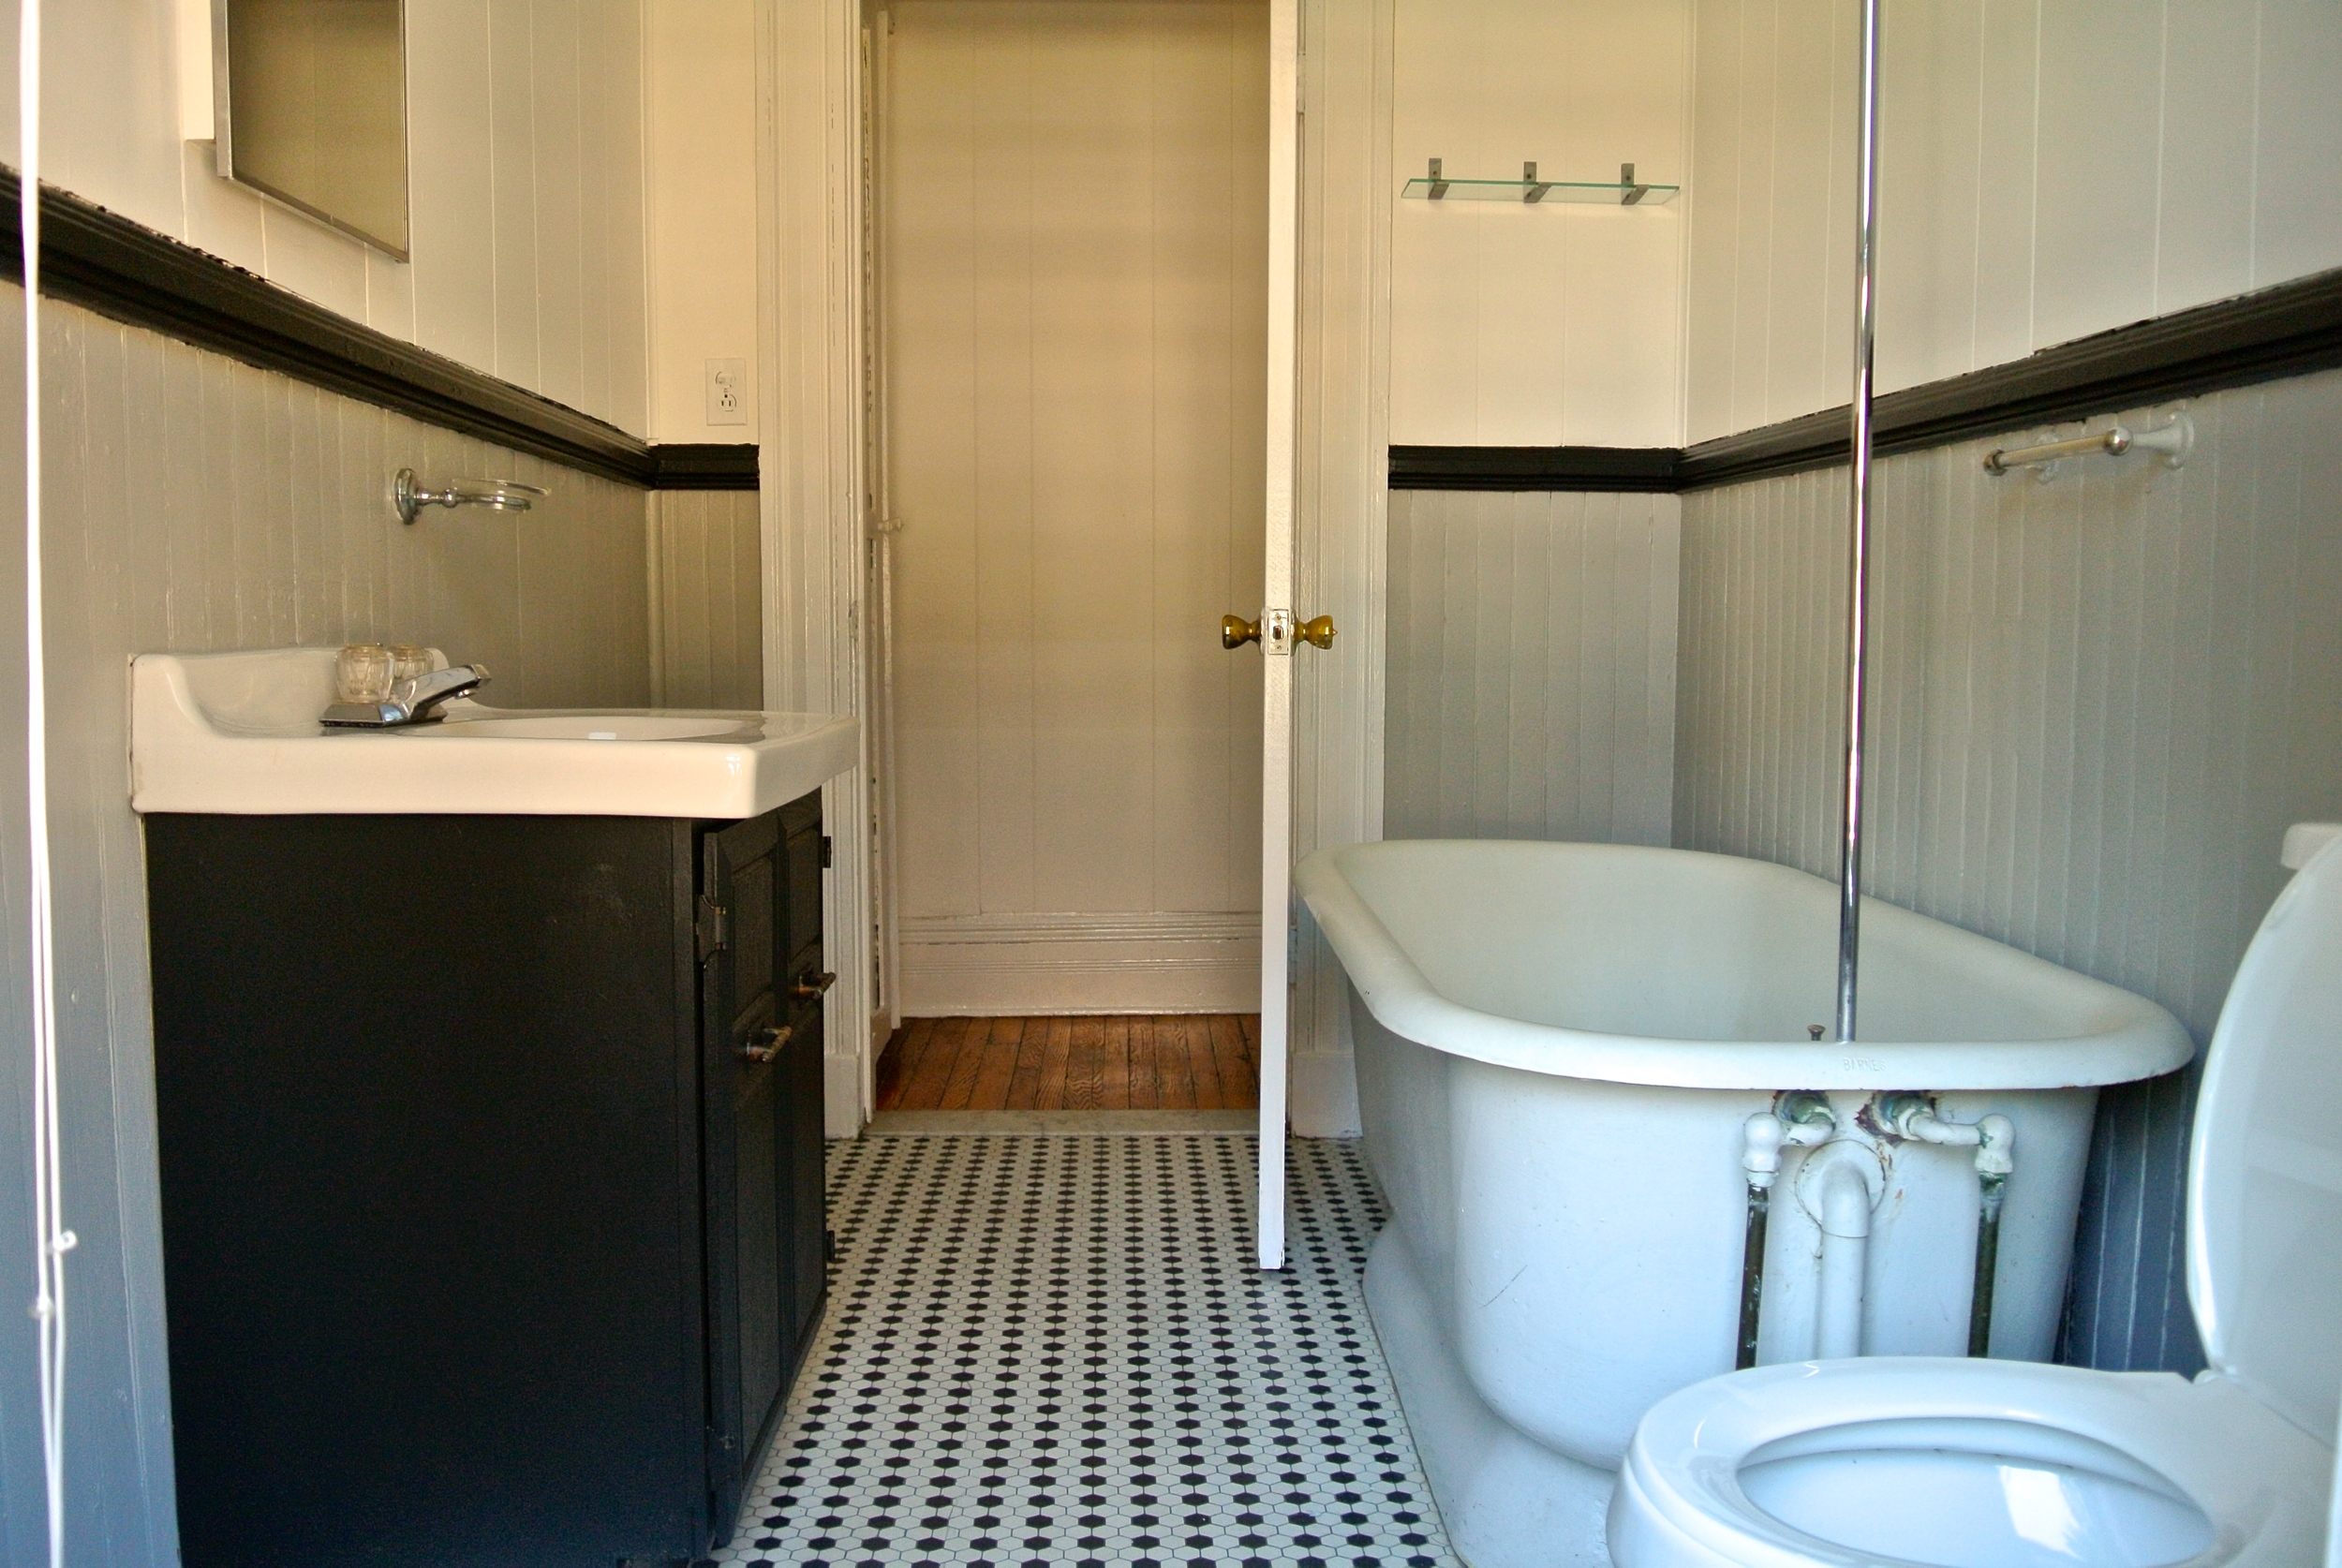 22StrathallanPk-Apt3-Bathroom.JPG